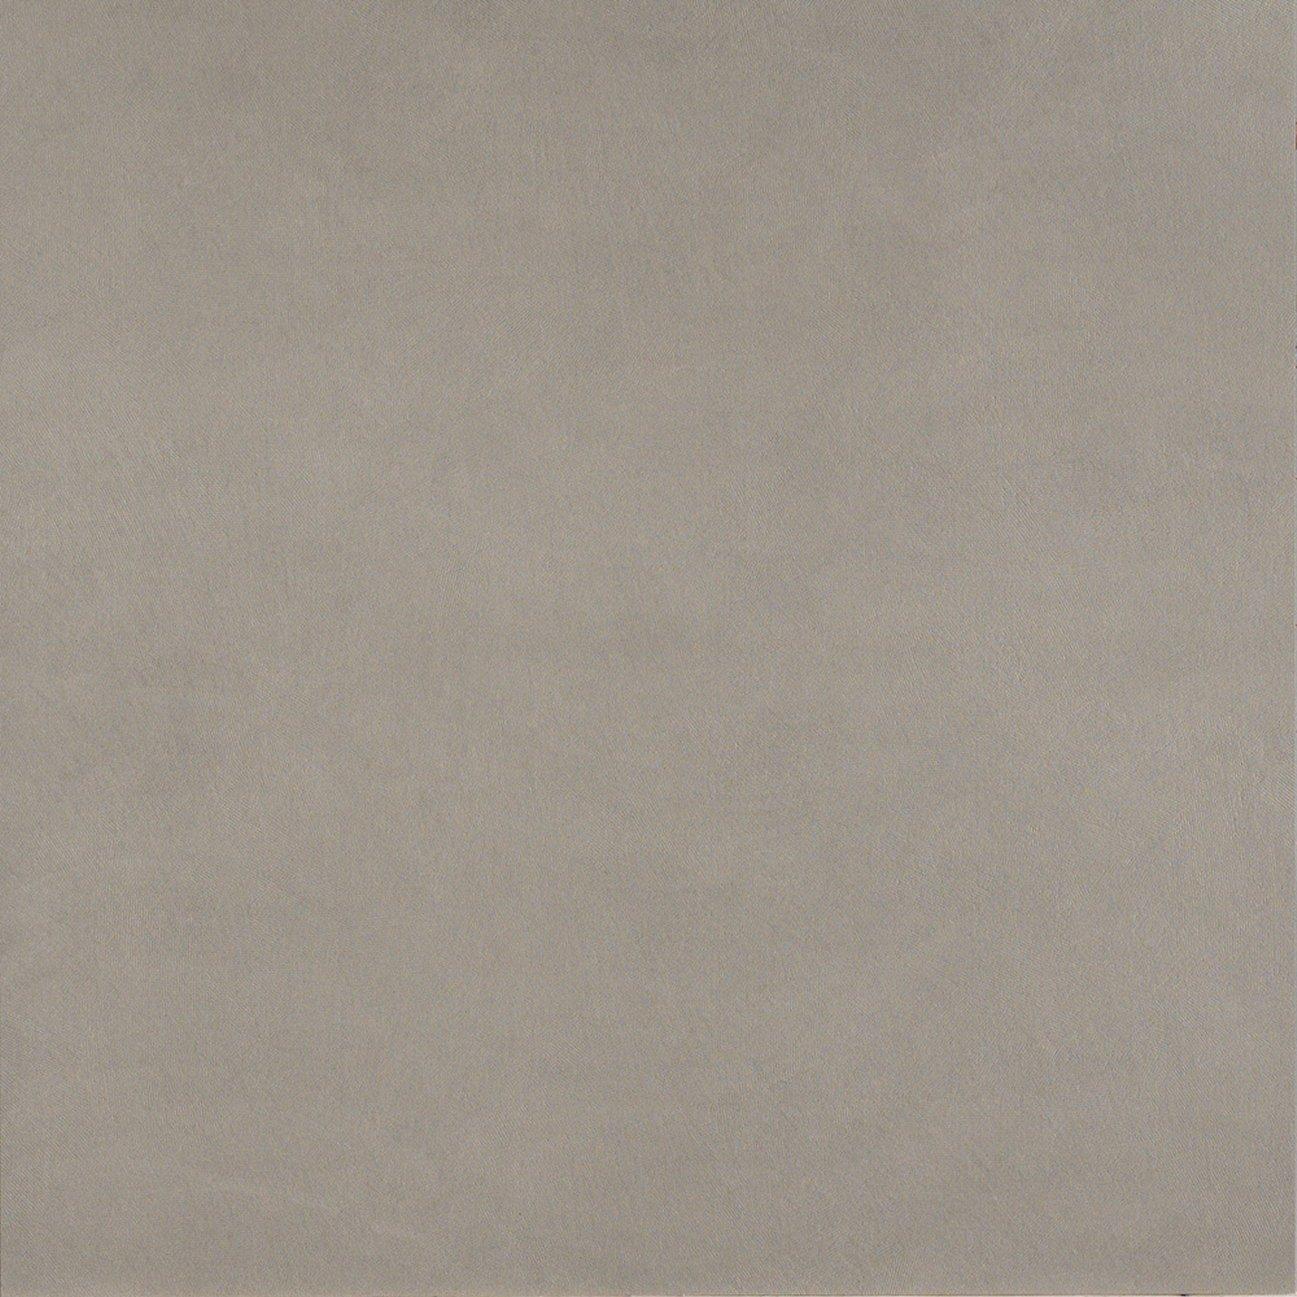 Mutina_Dechirer L. S. Trace cemento 60x60rett.2nd choice €.30sqm